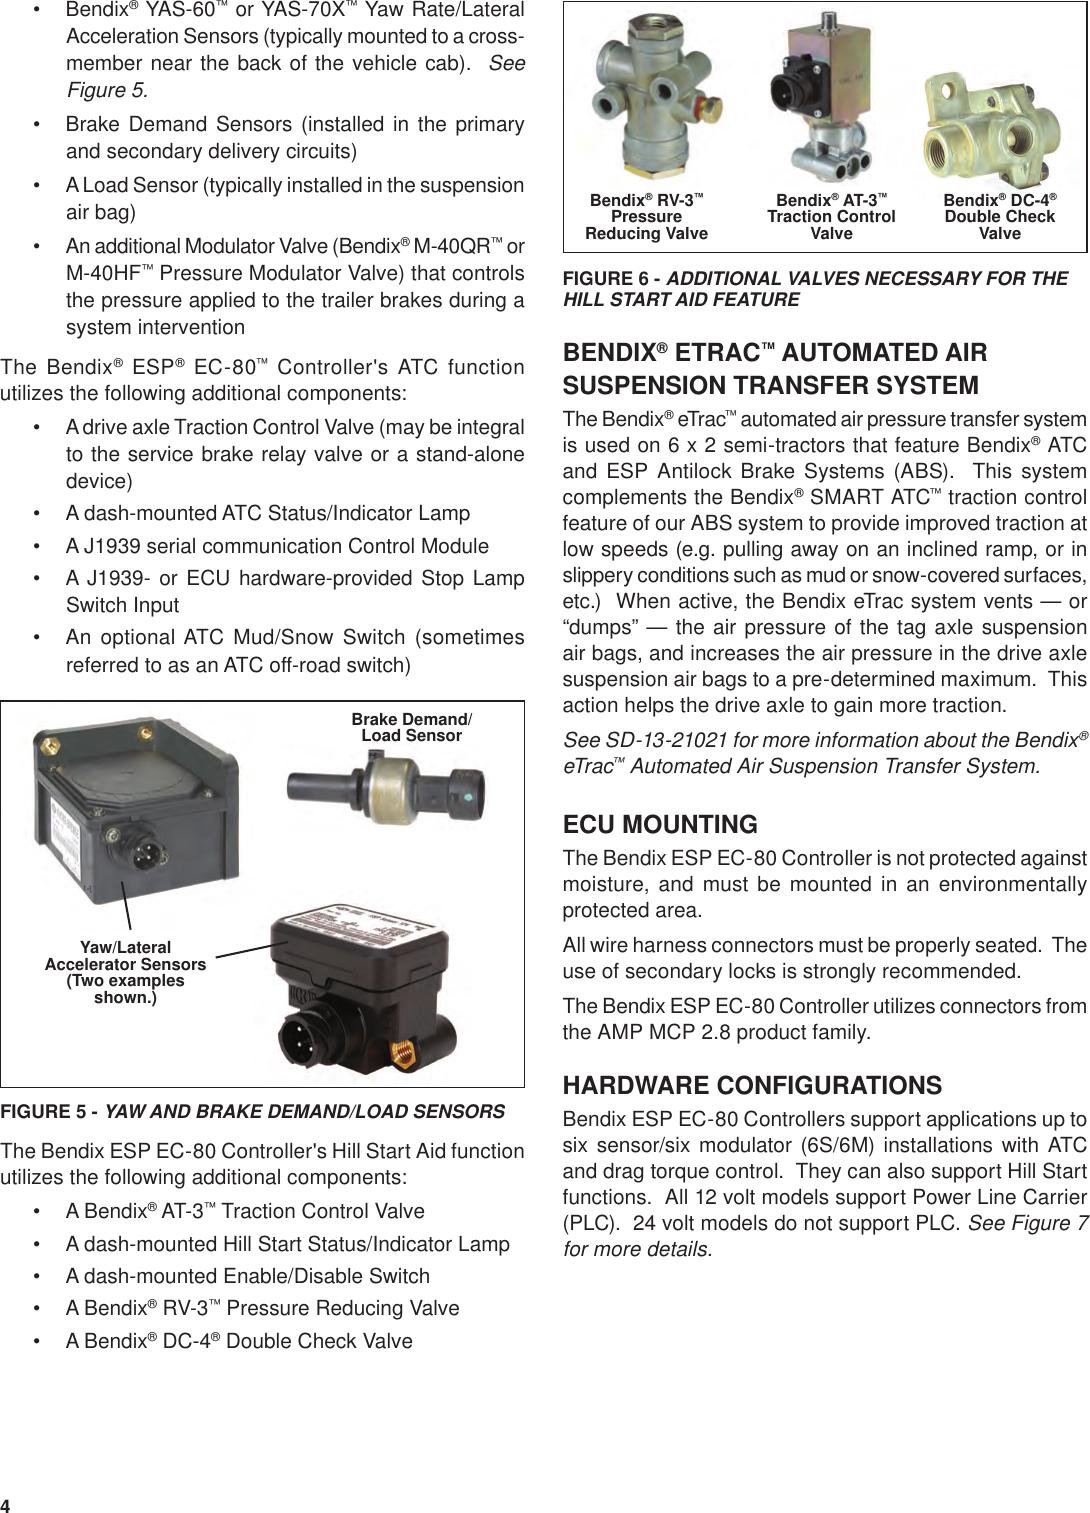 Bendix Sd 13 4986 Users Manual